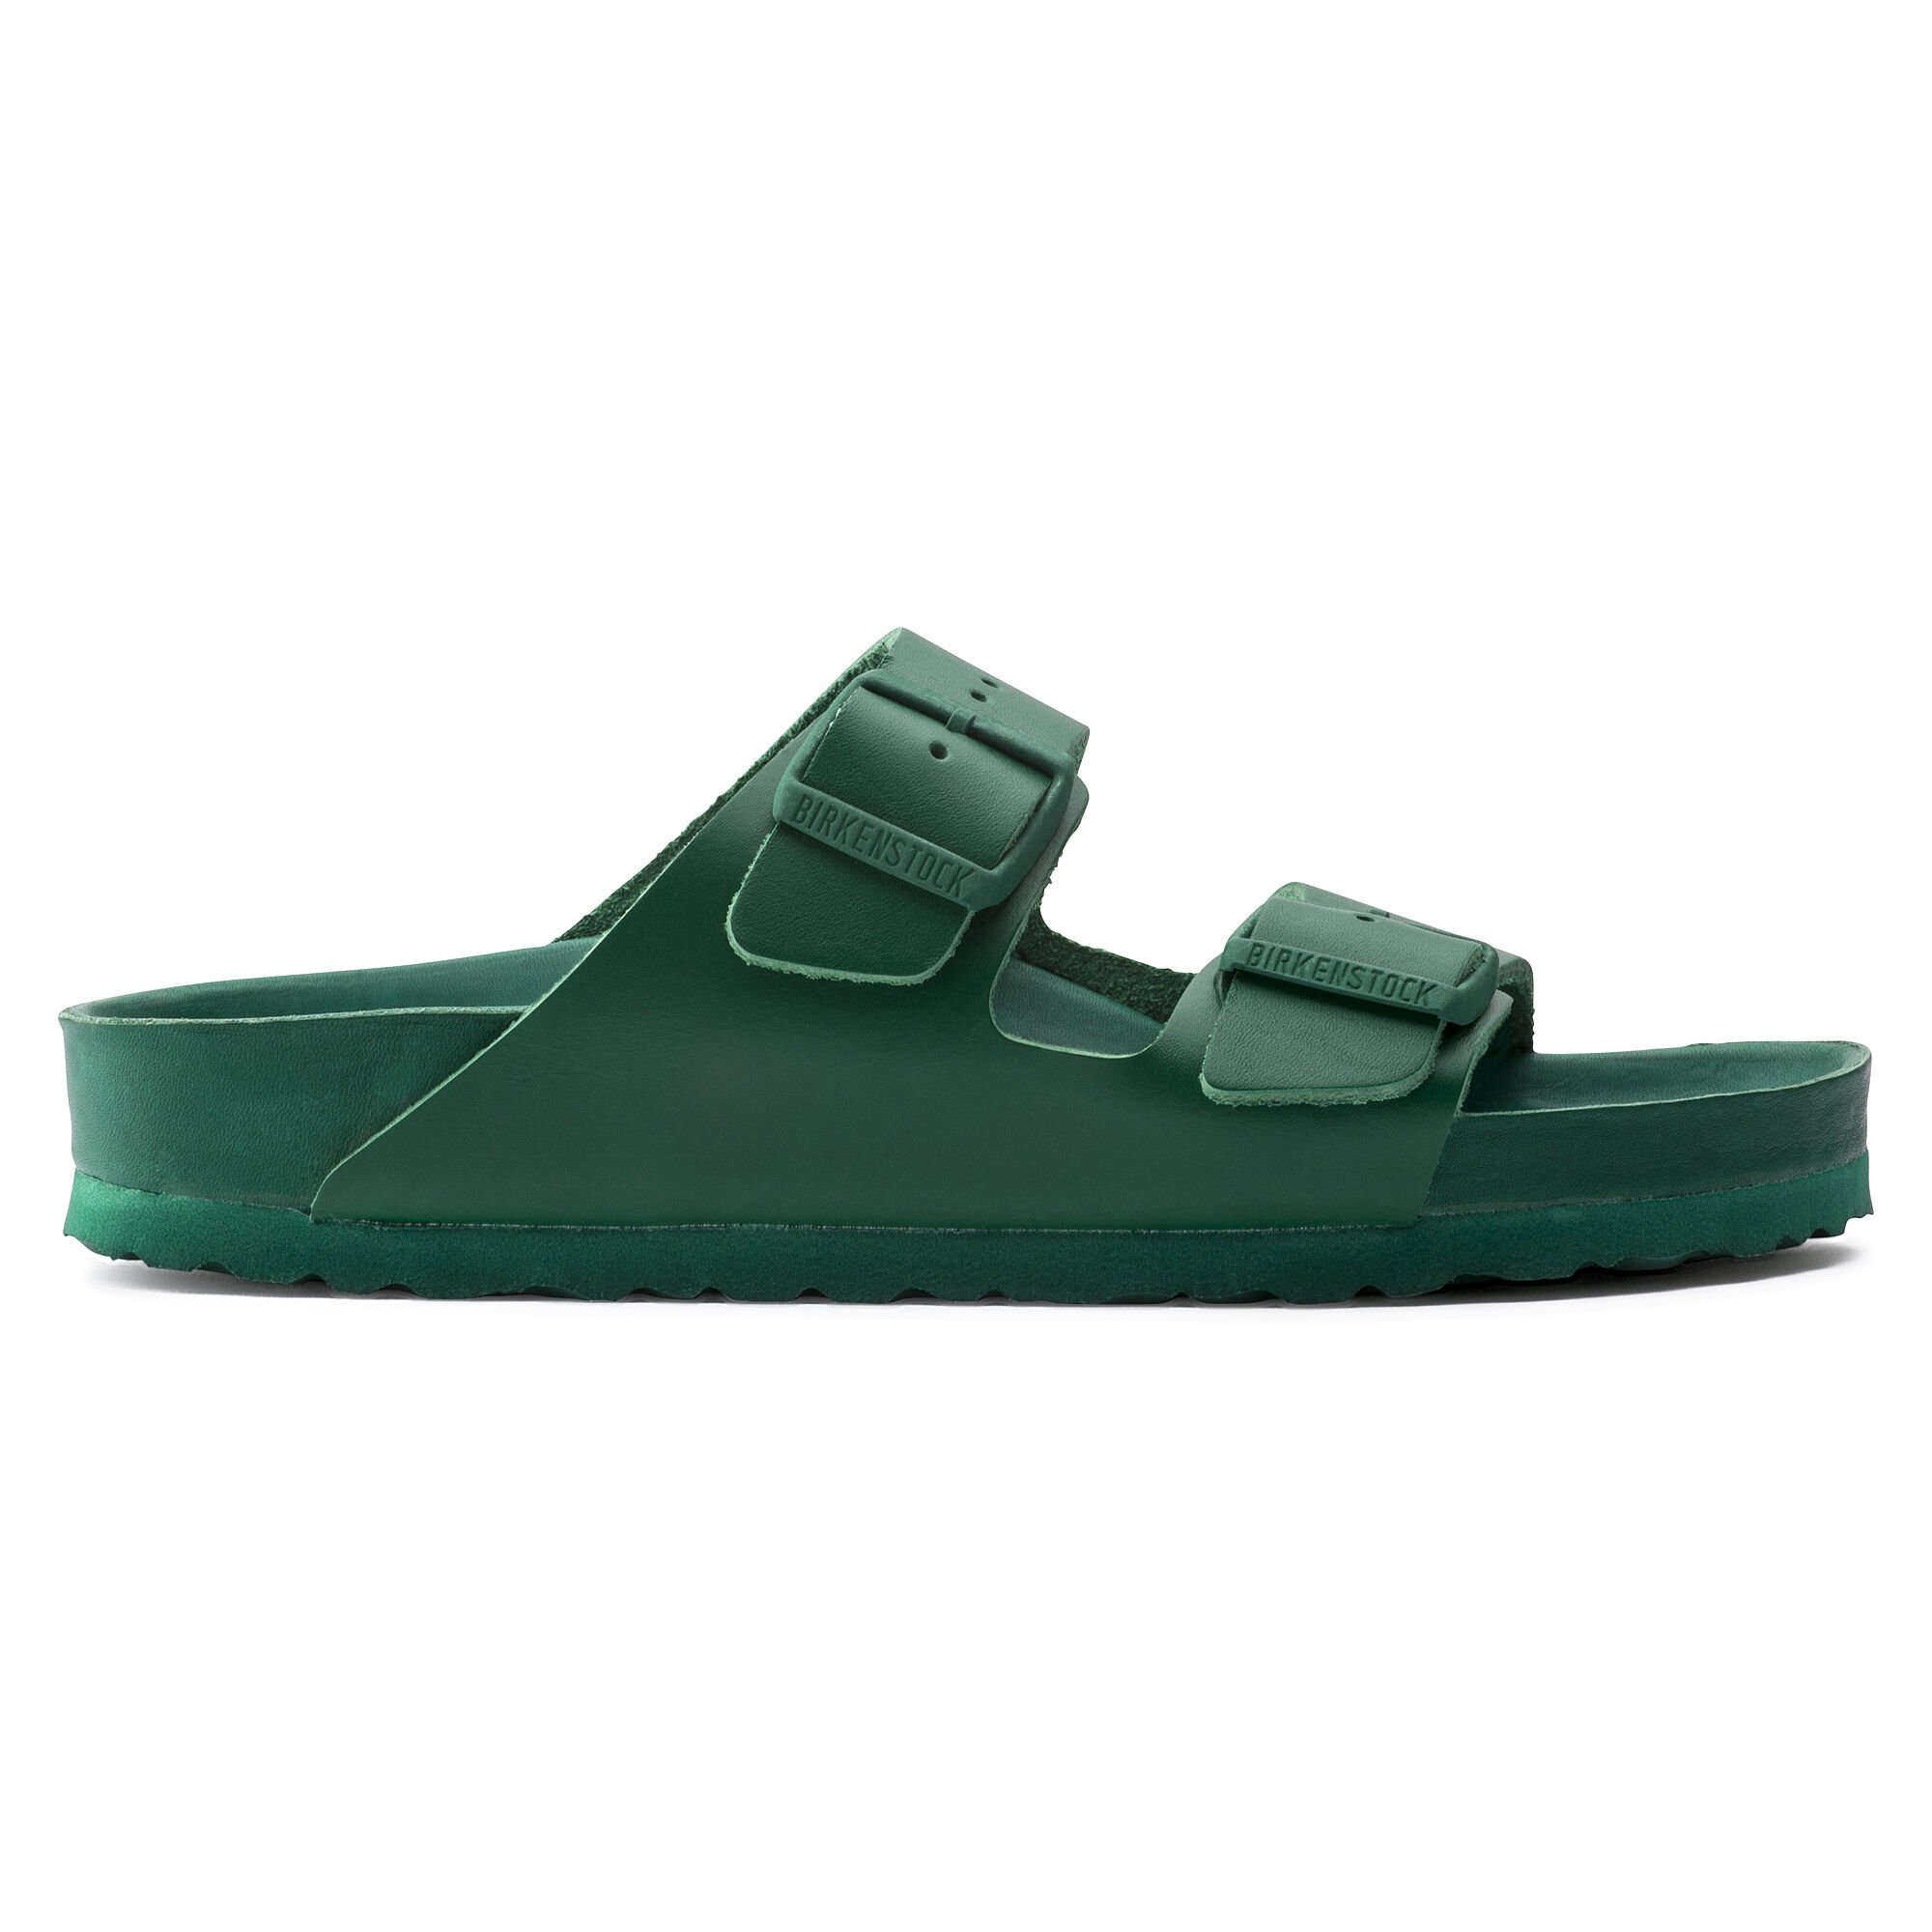 Arizona Natural Leather Green | shop online at BIRKENSTOCK